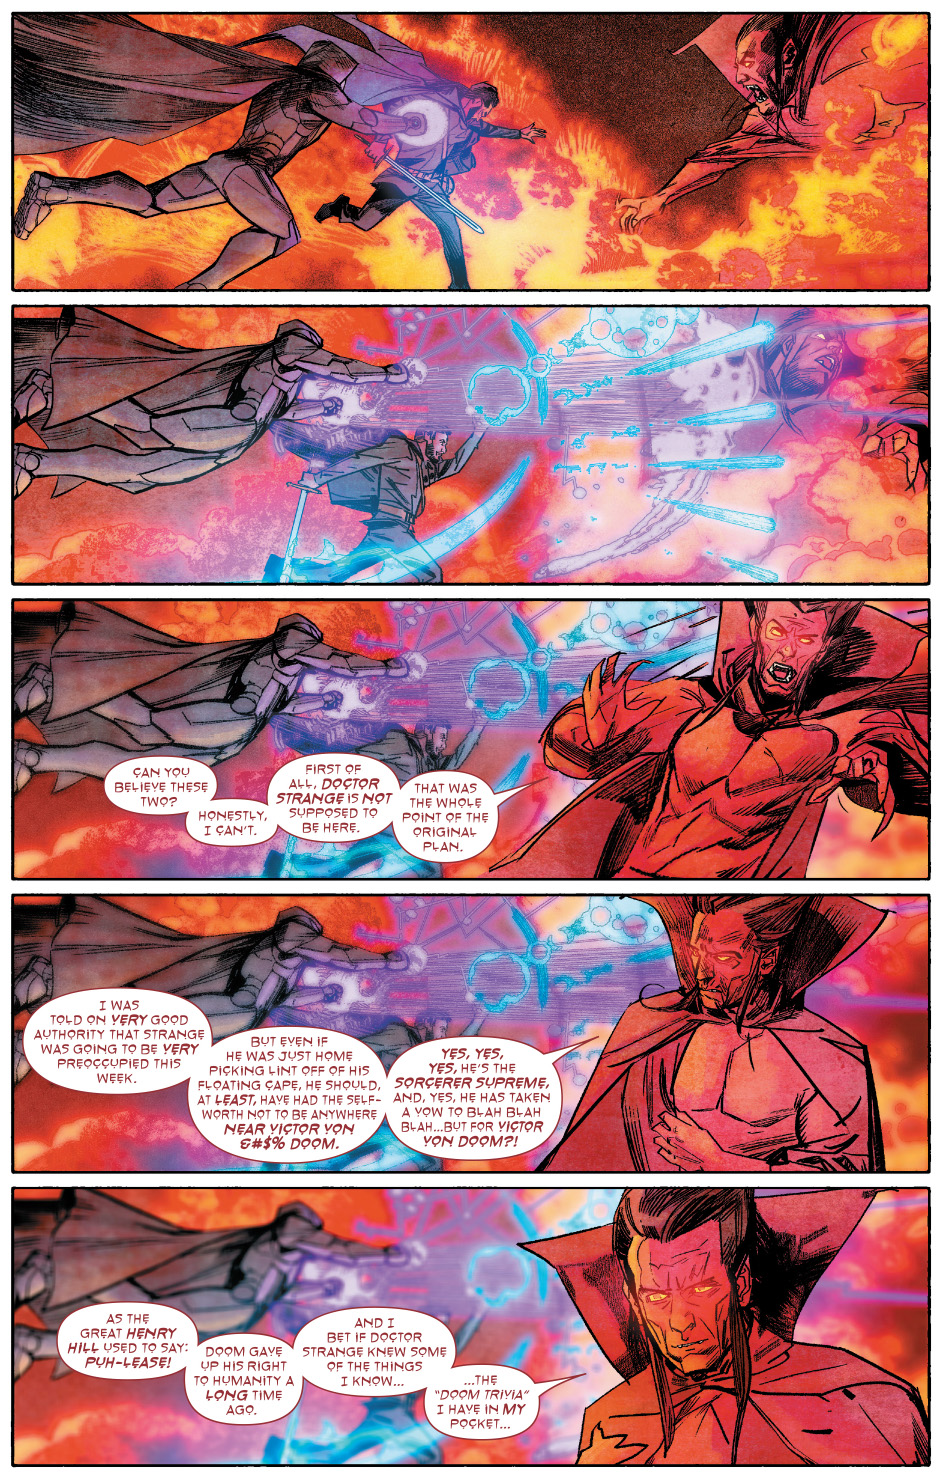 3e5fe91a840 Why Mephisto Hates Victor Von Doom | Comicnewbies